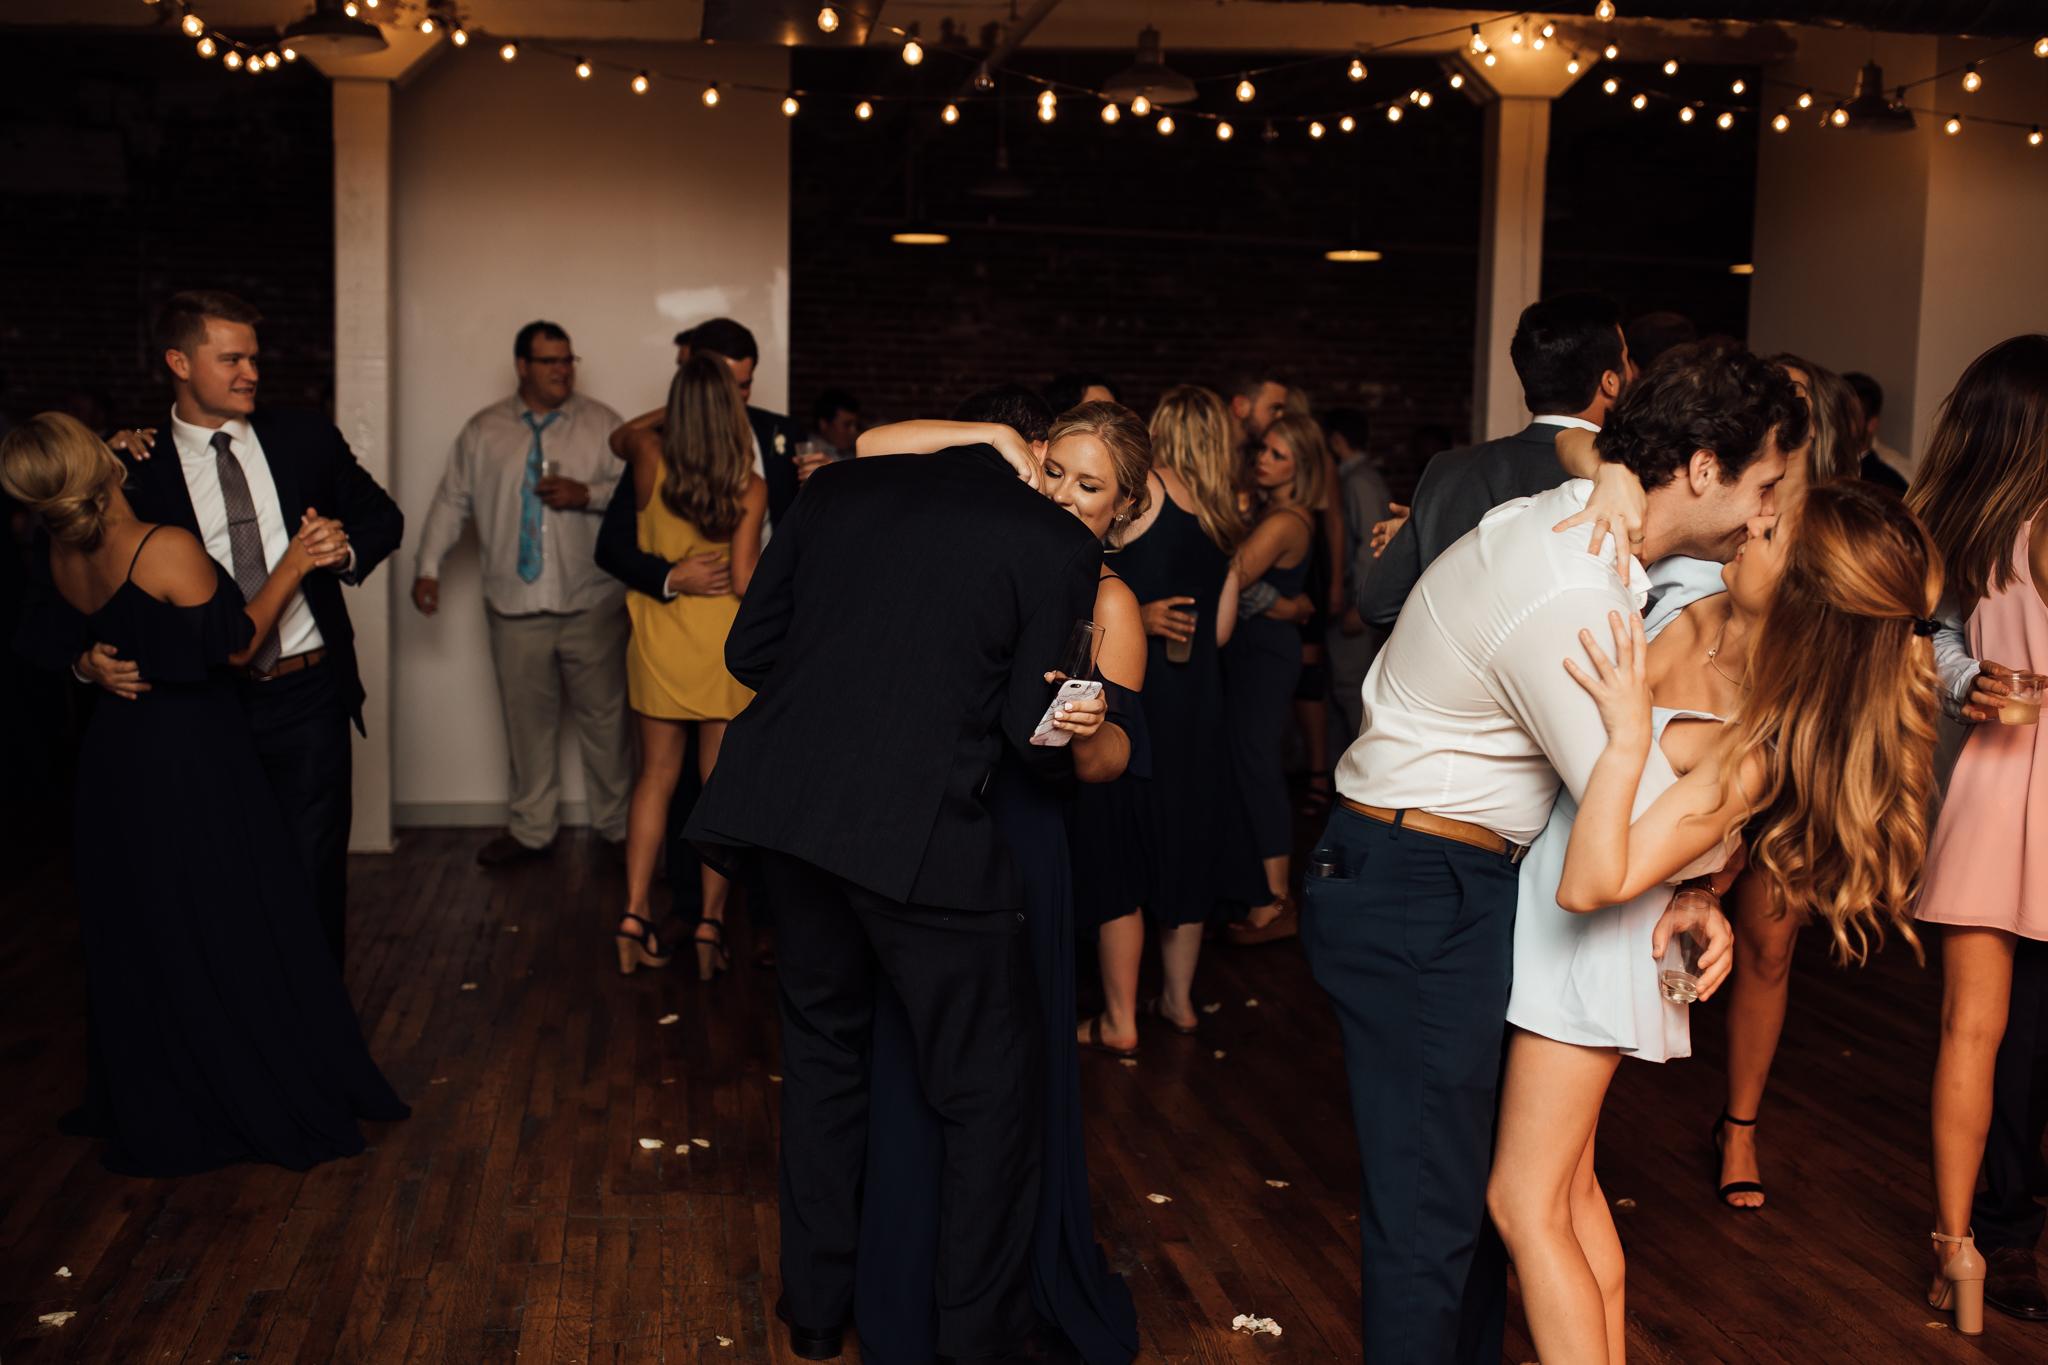 409smain-downtown-memphis-wedding-venue-thewarmtharoundyou (138 of 243).jpg